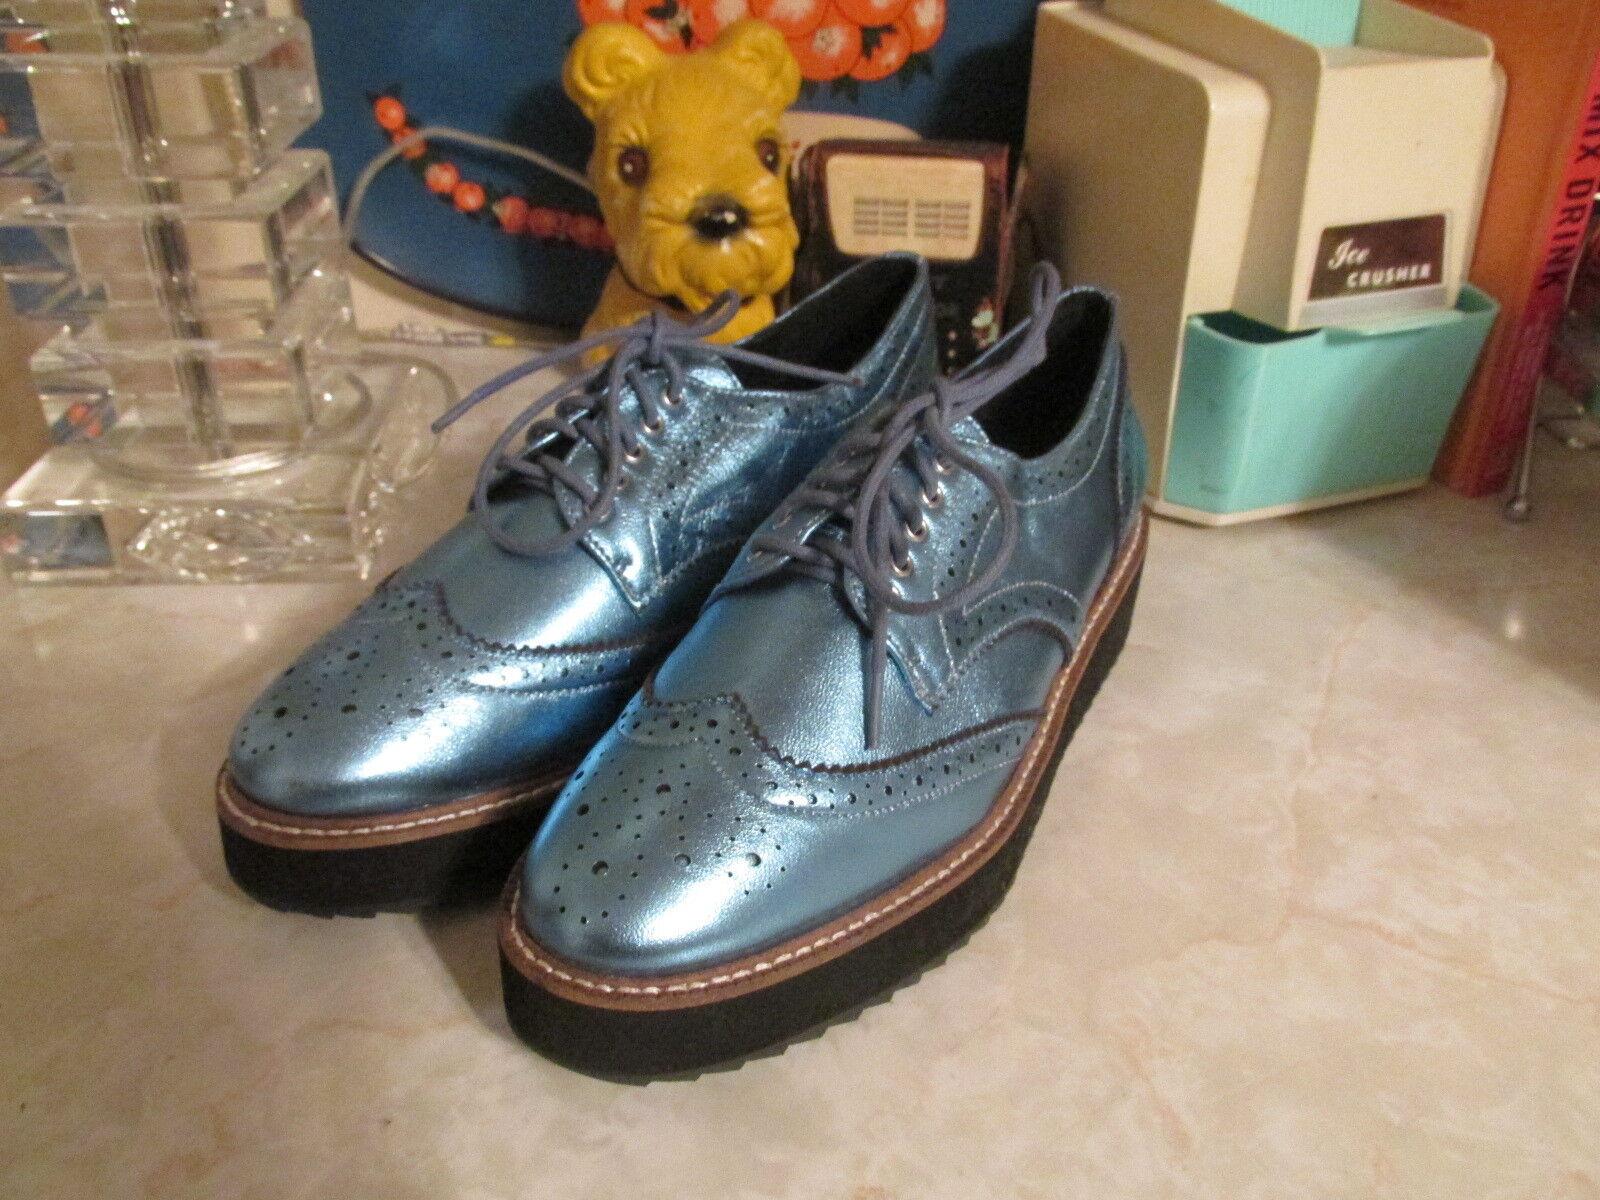 Shellys London Emma bleu Metallic Shiny Low Platform Wingtip Oxford chaussures EU39 9